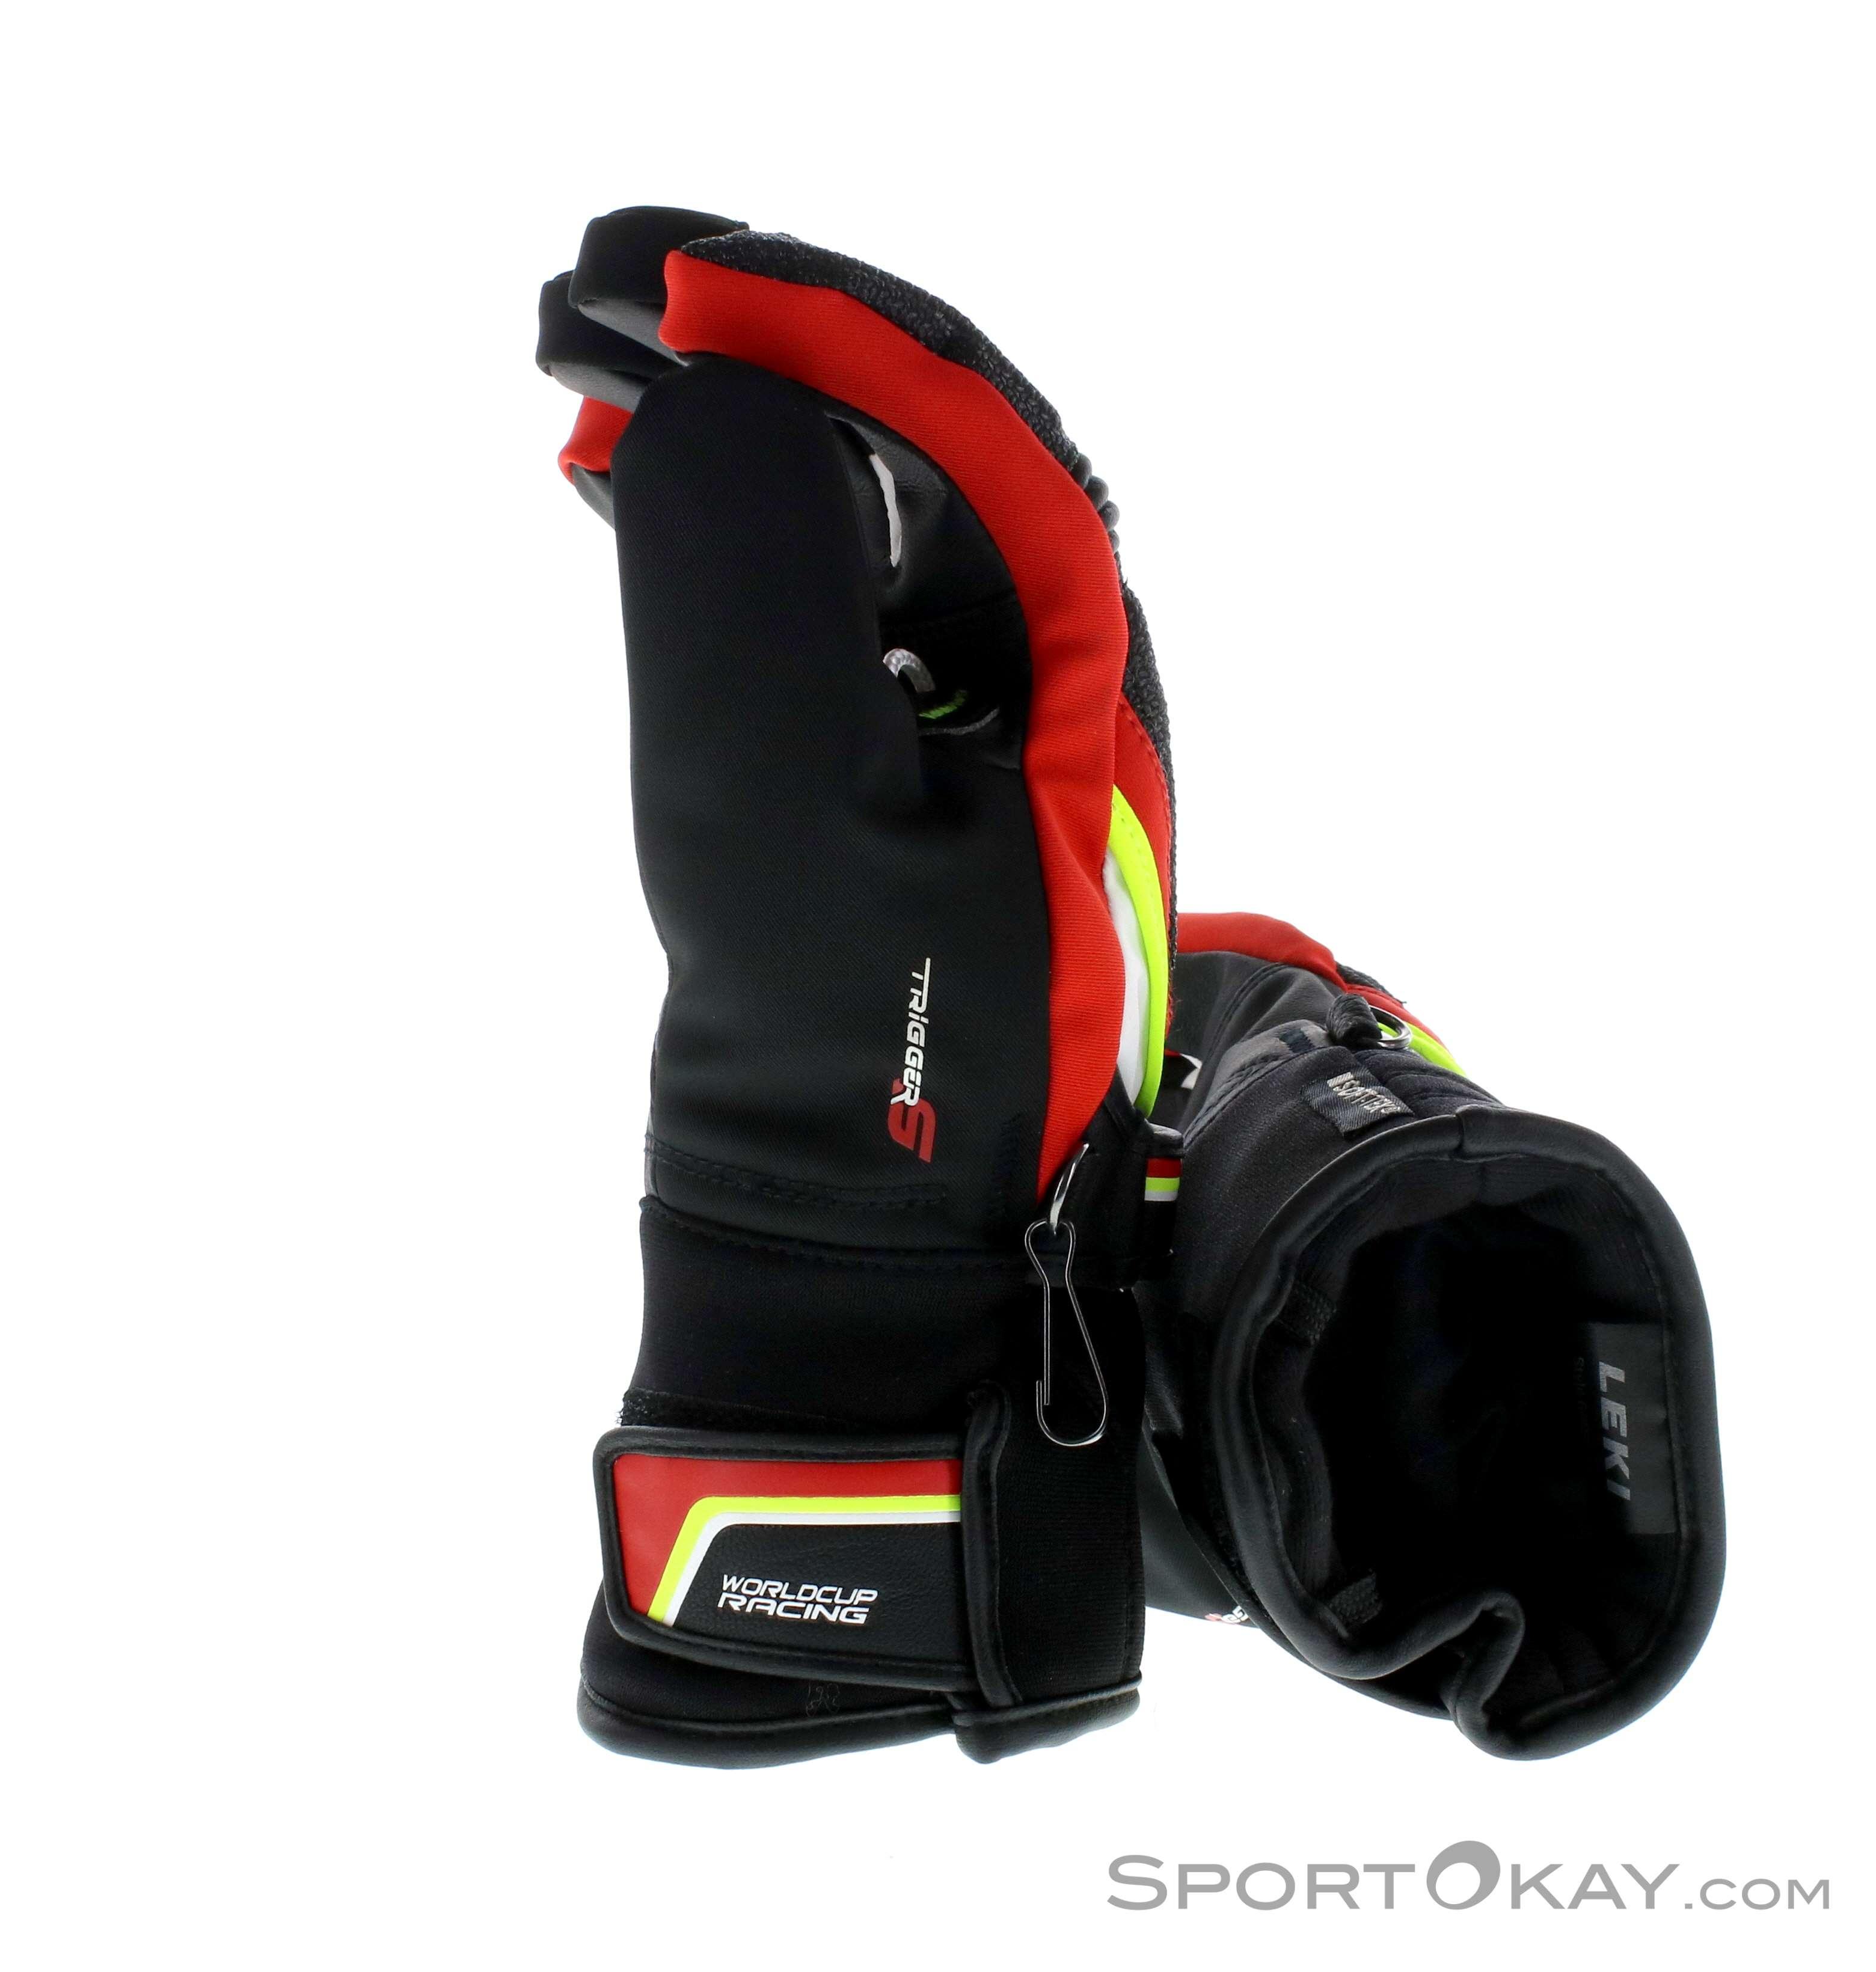 Jugend Handschuhe mit Trigger S Bekleidung Skisport & Snowboarding Leki Race Coach C-Tech S Junior